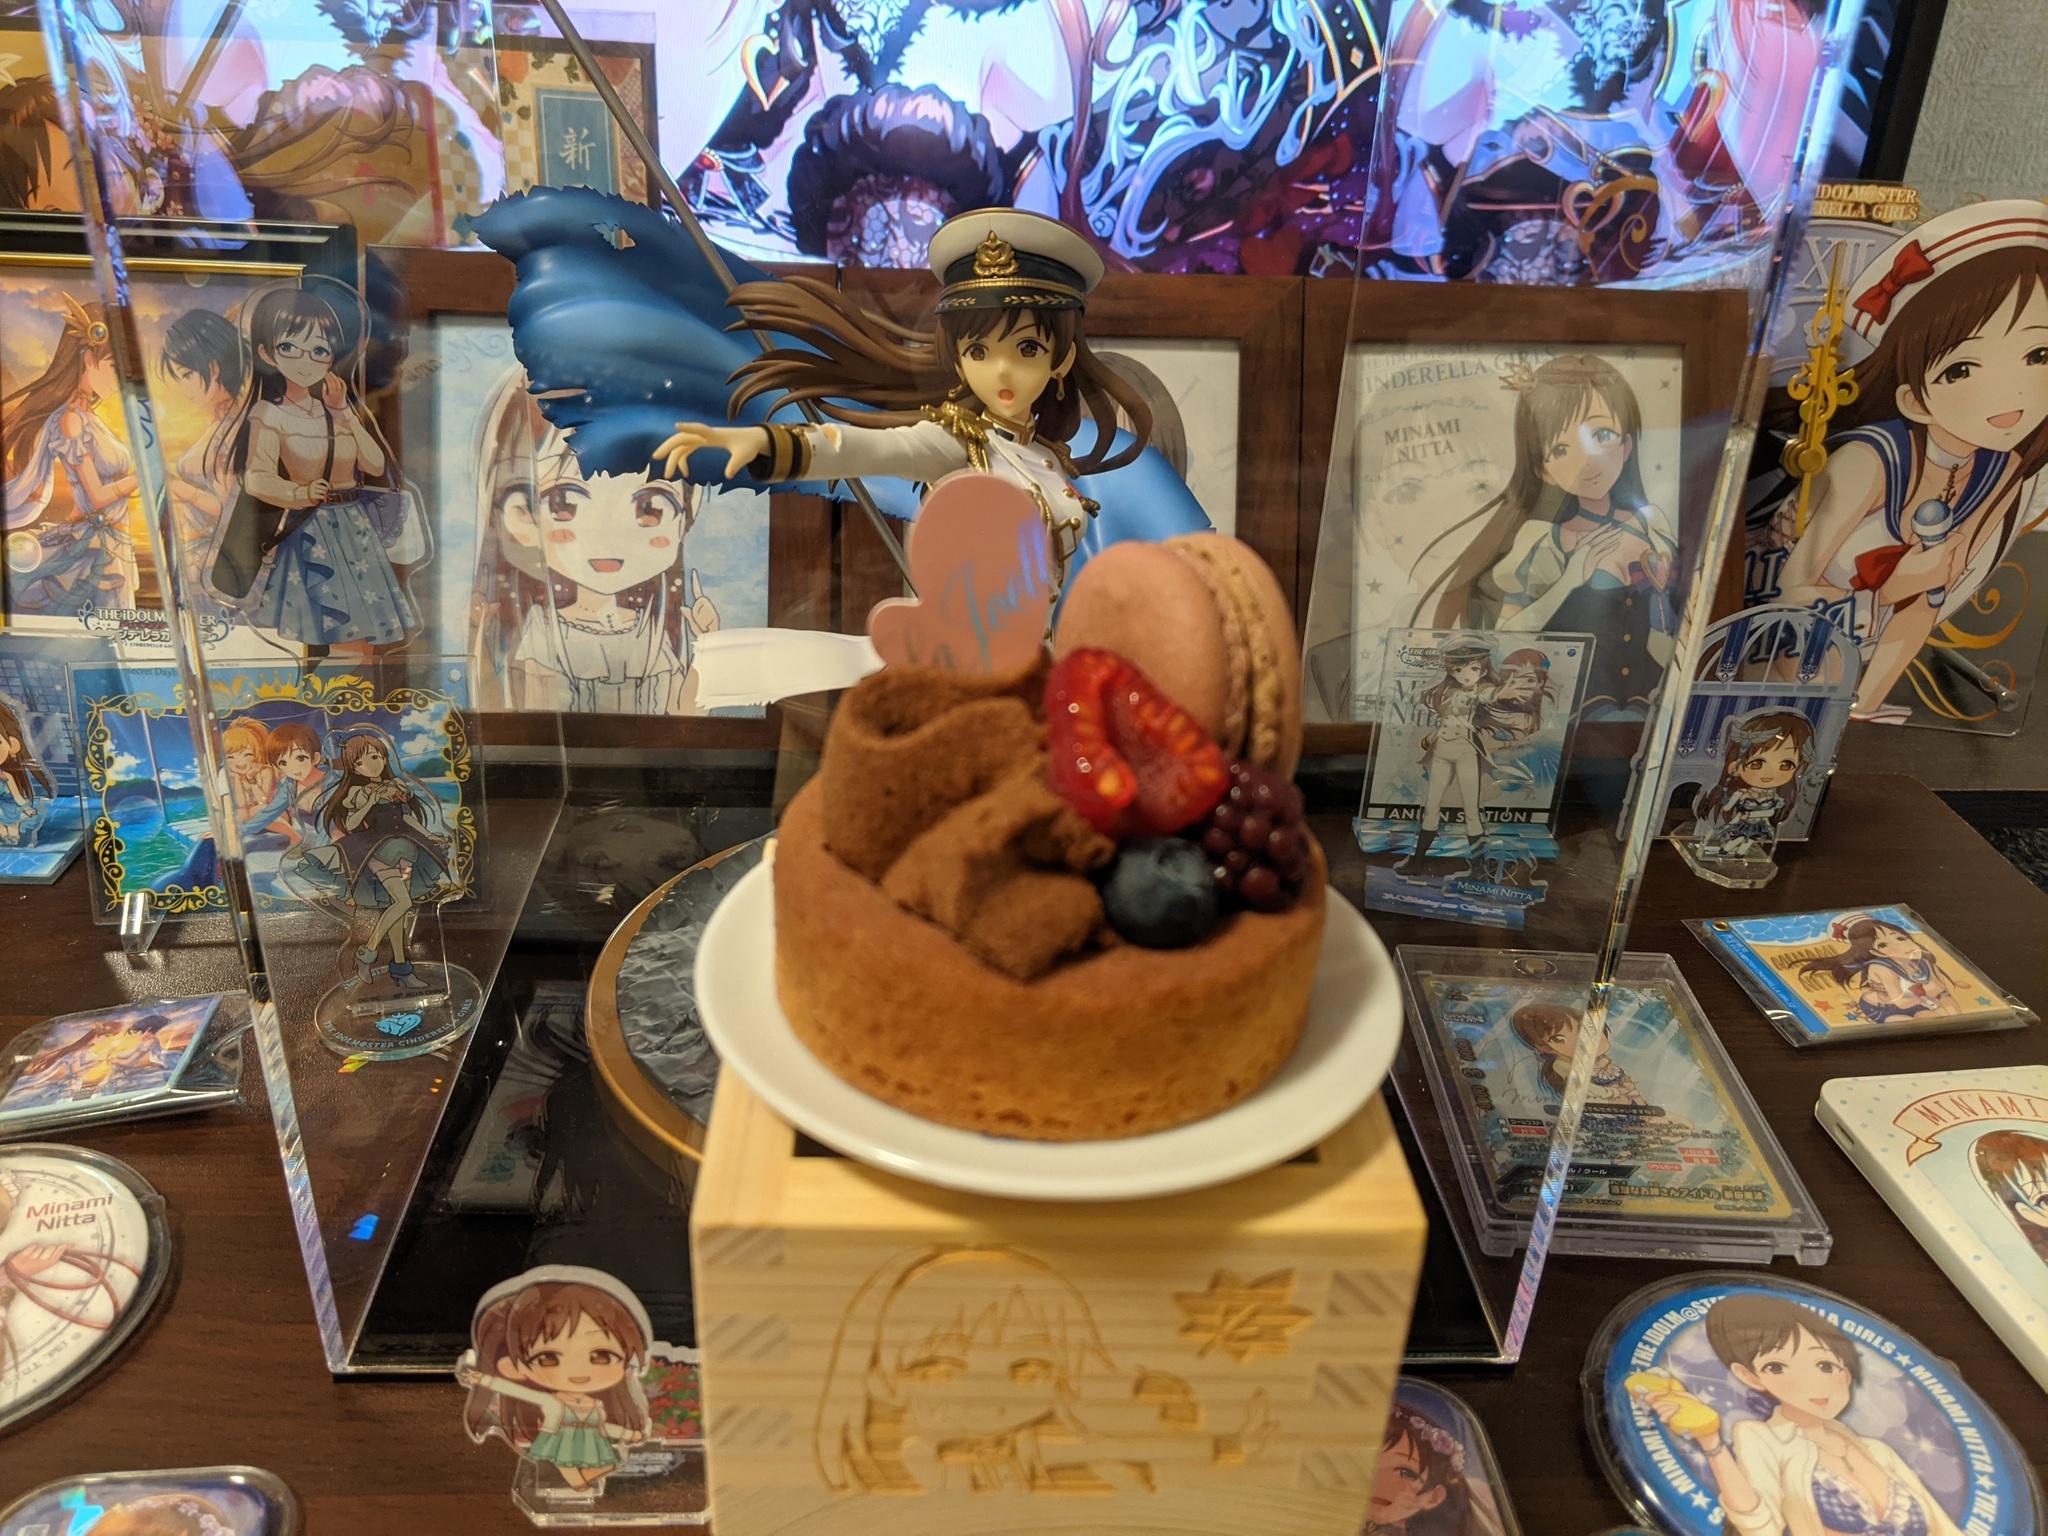 [CG] 7/27 是新田美波的生日